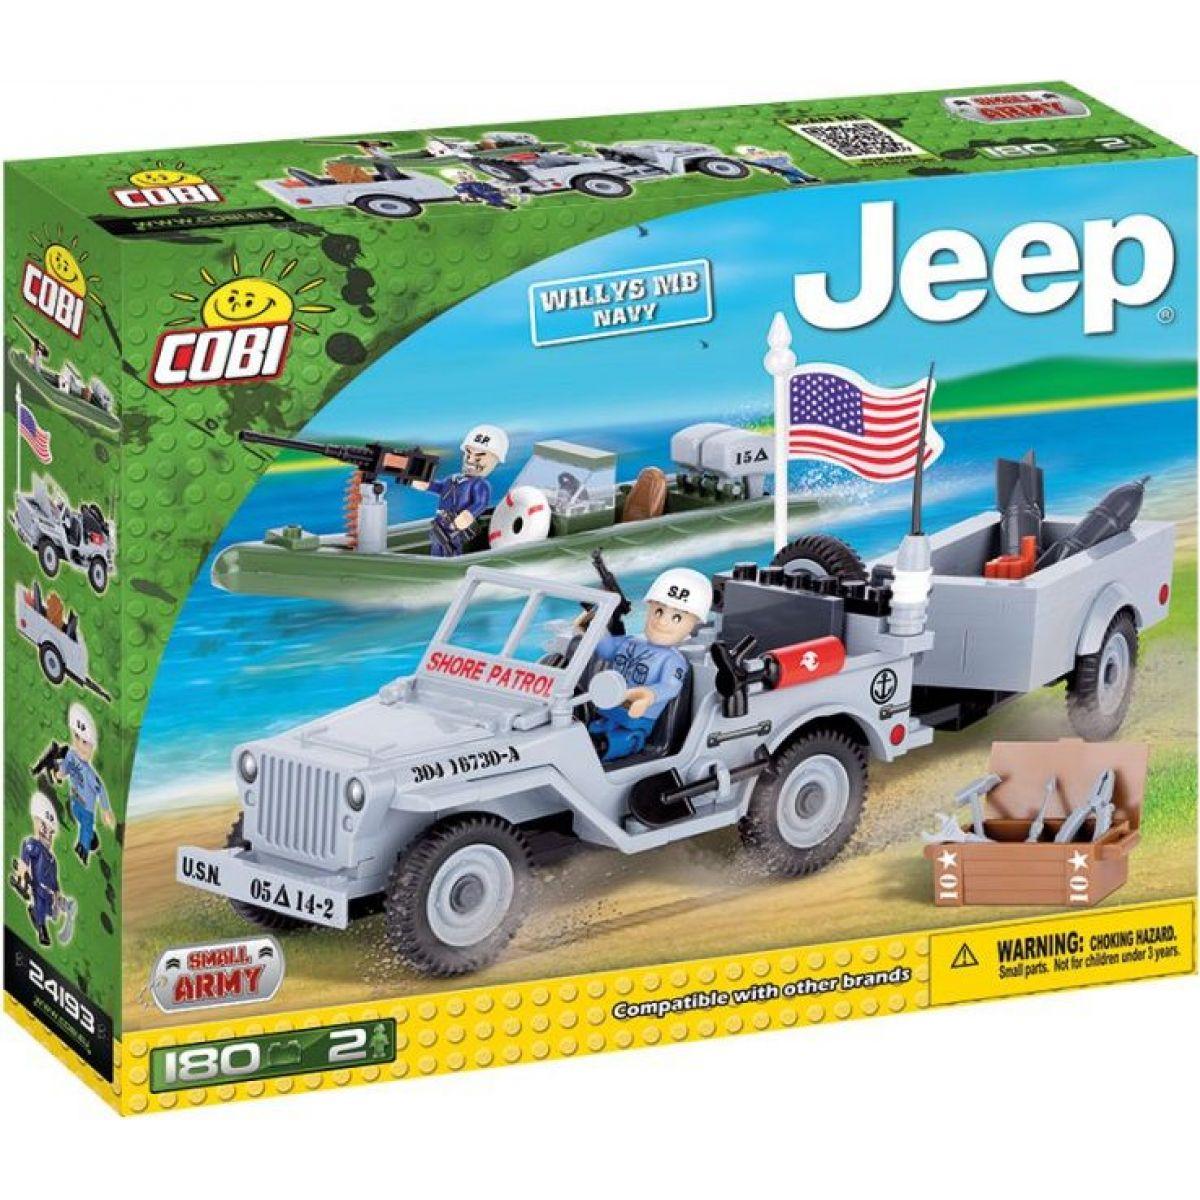 Cobi Malá armáda 24193 Jeep Willys MB US Navy